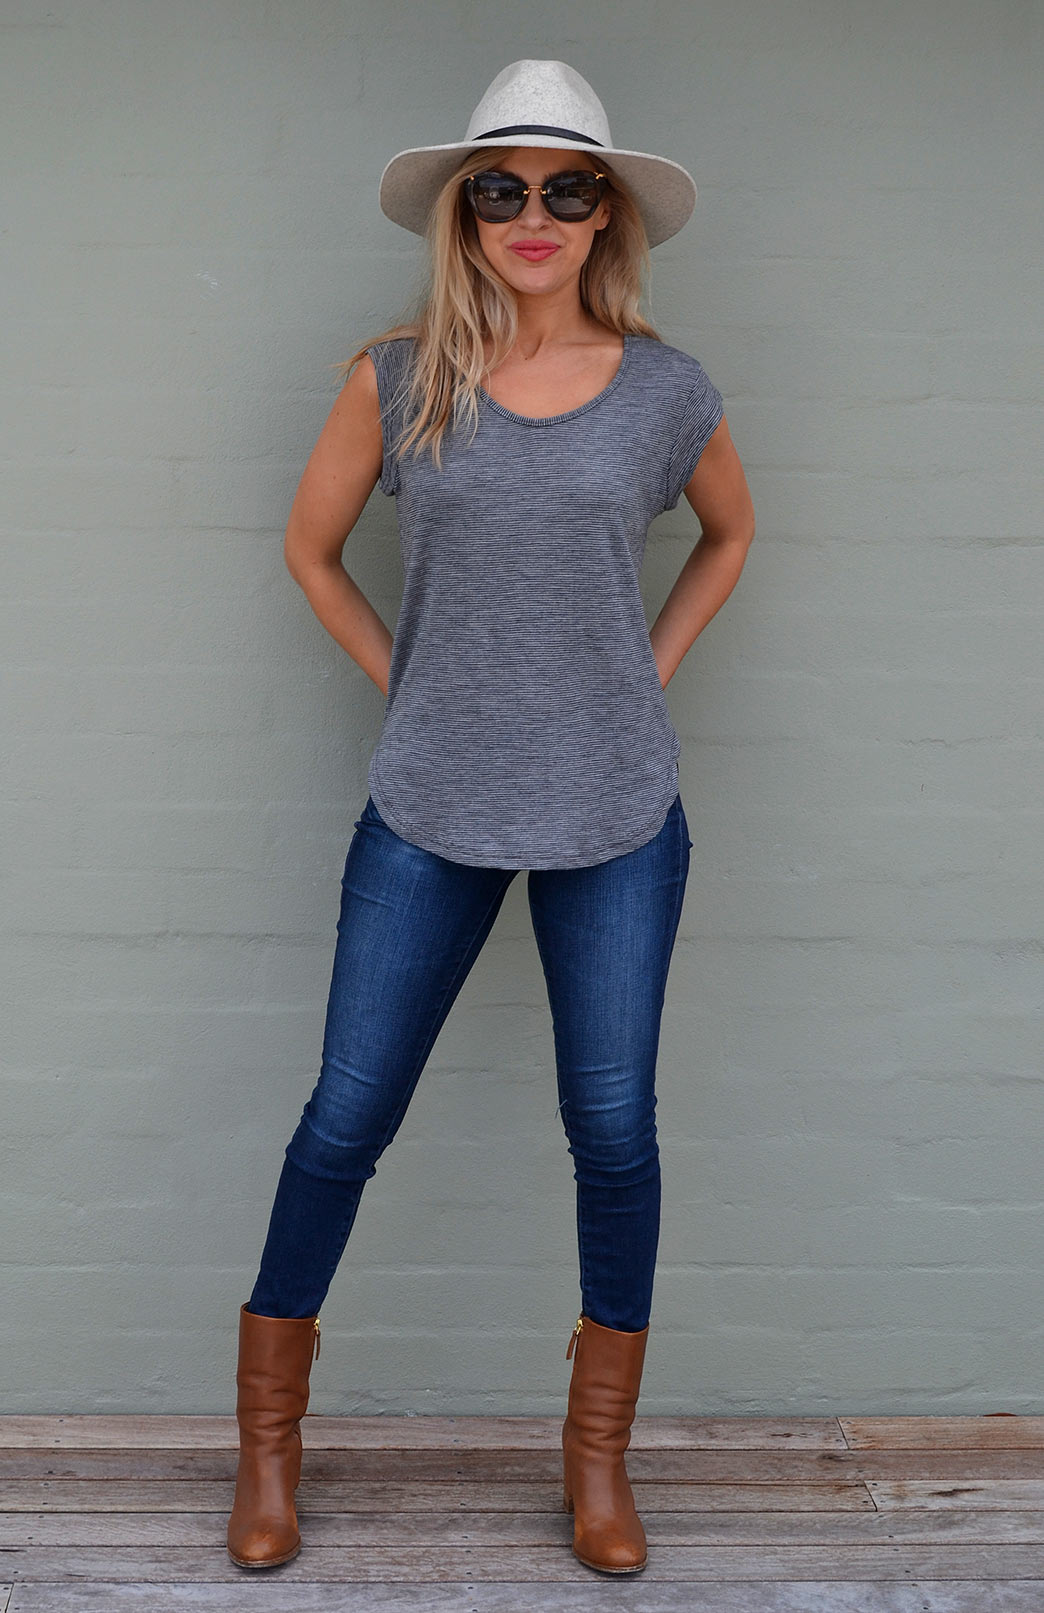 Cap Sleeve T-Shirt - Women's Cap Sleeve Wool Spring Summer Top - Smitten Merino Tasmania Australia